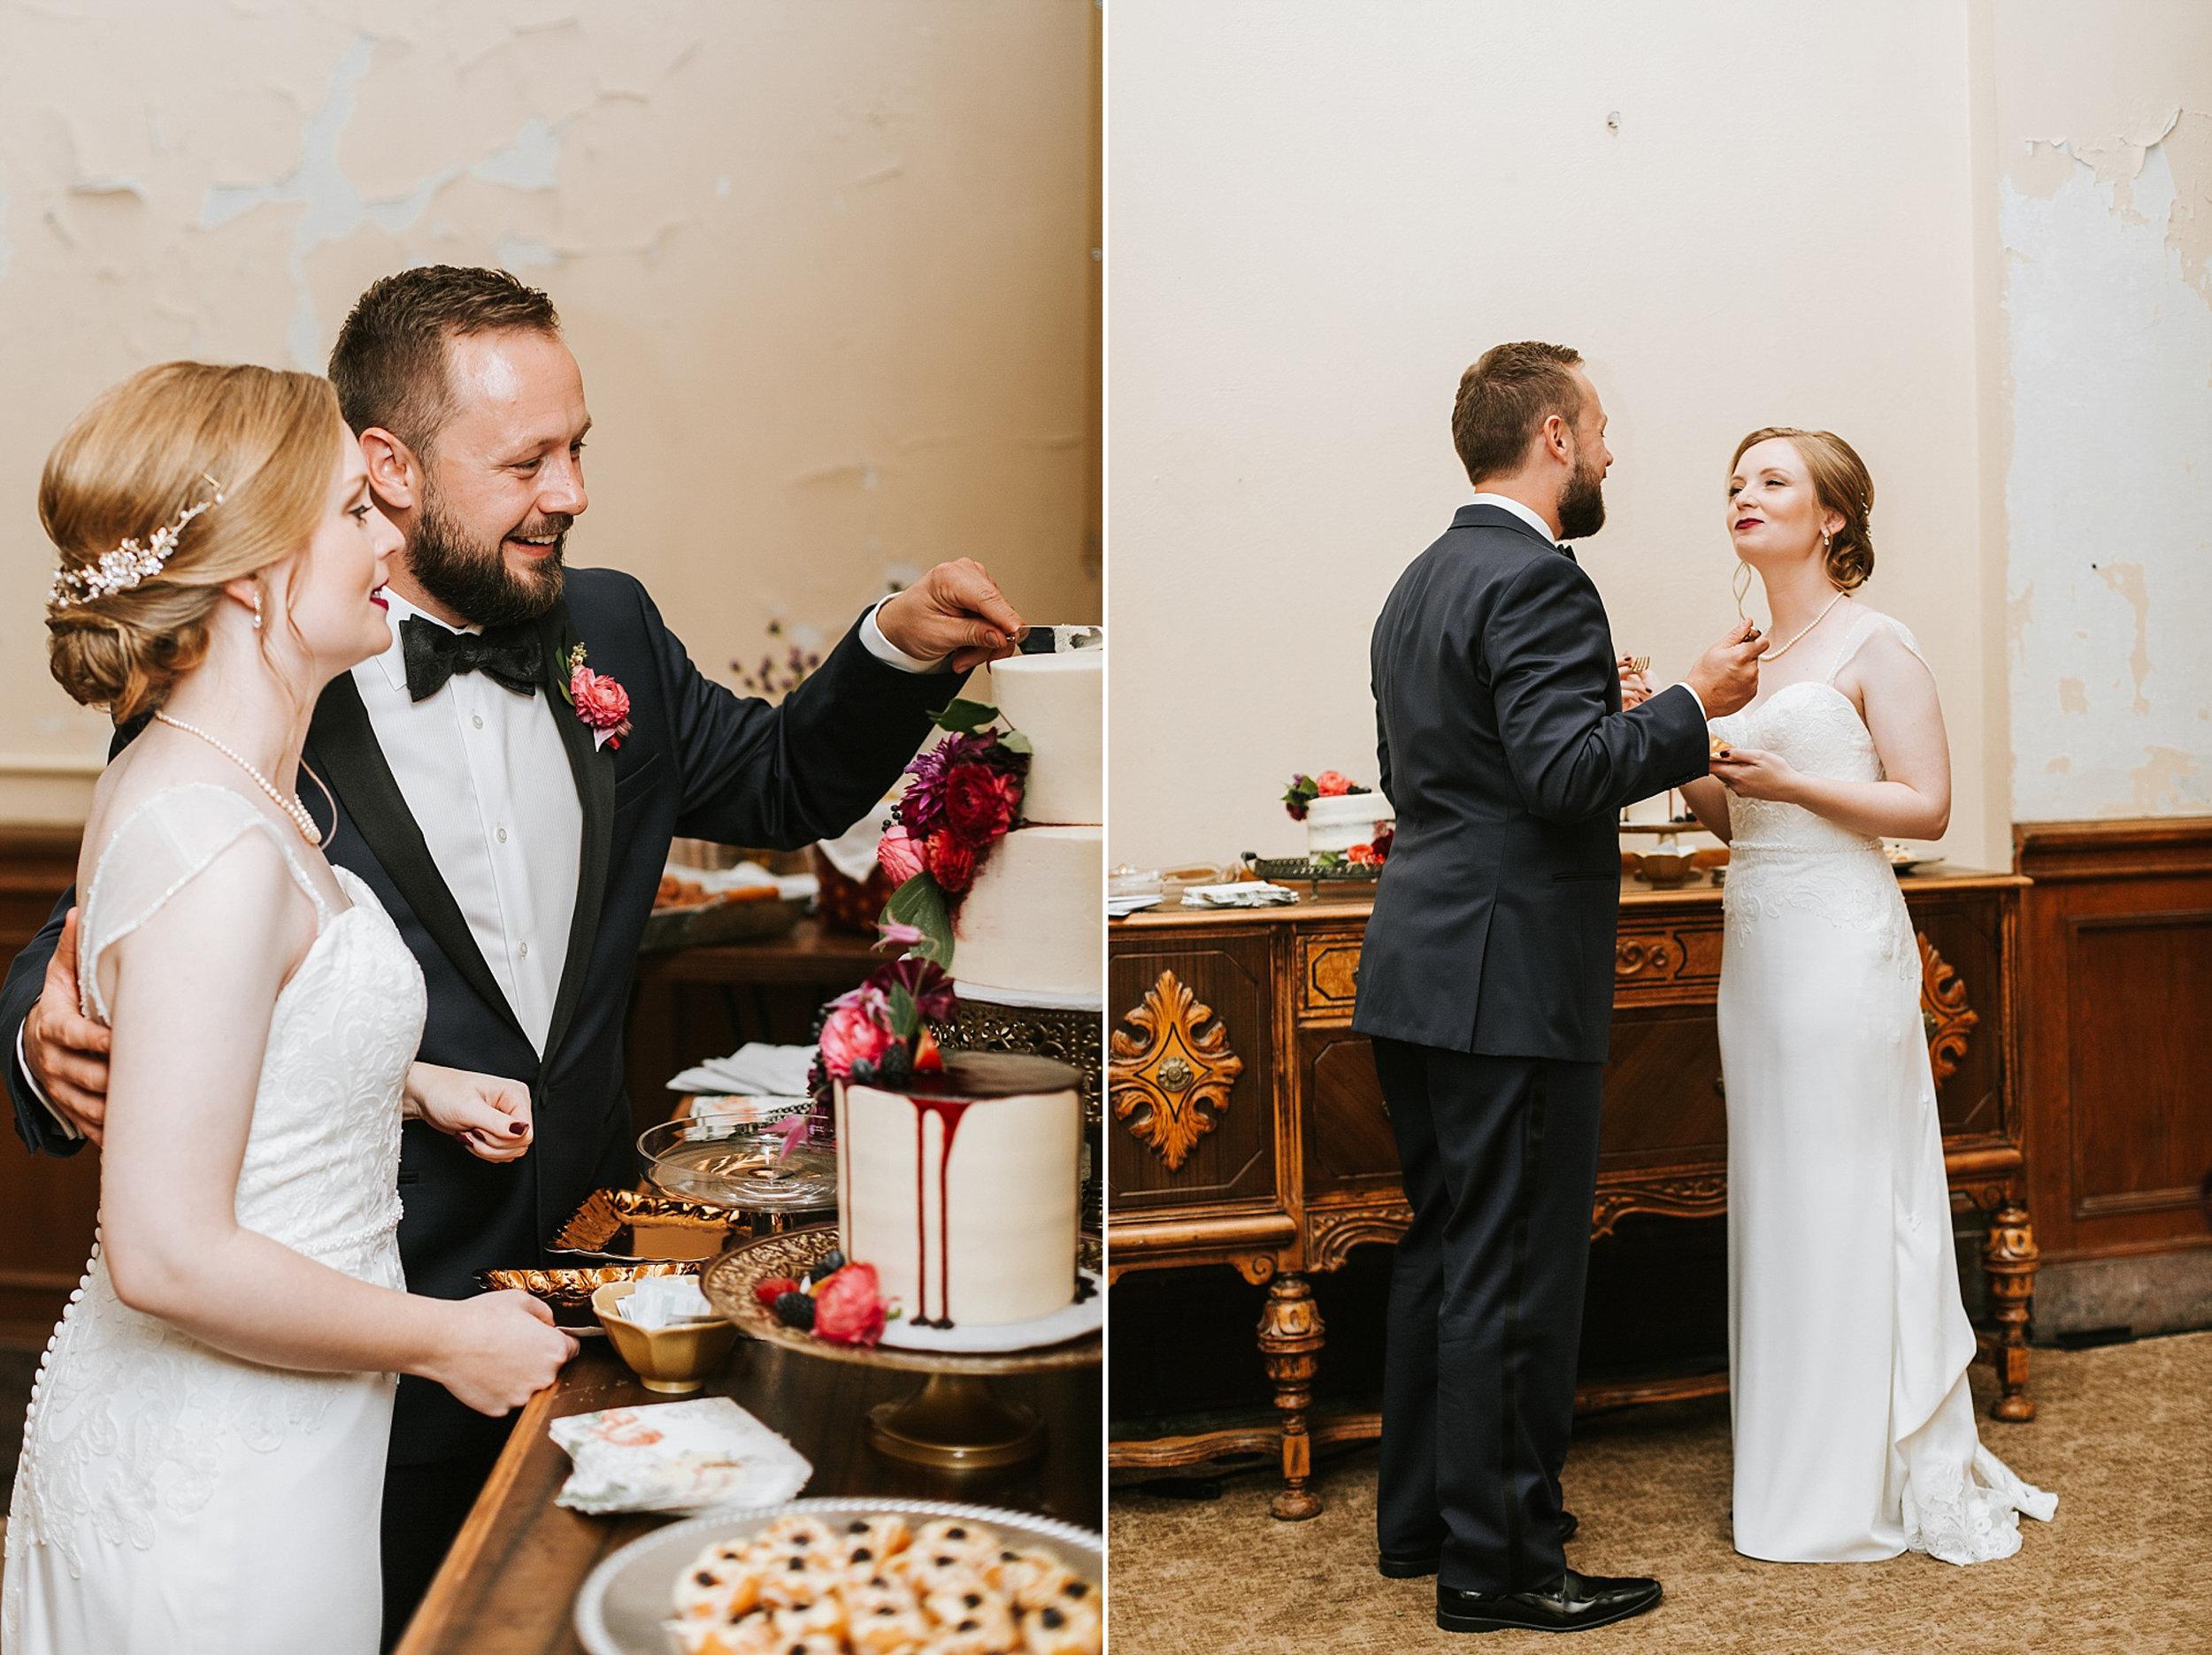 Brooke Townsend Photography - Ohio Wedding Photographer-196.jpg